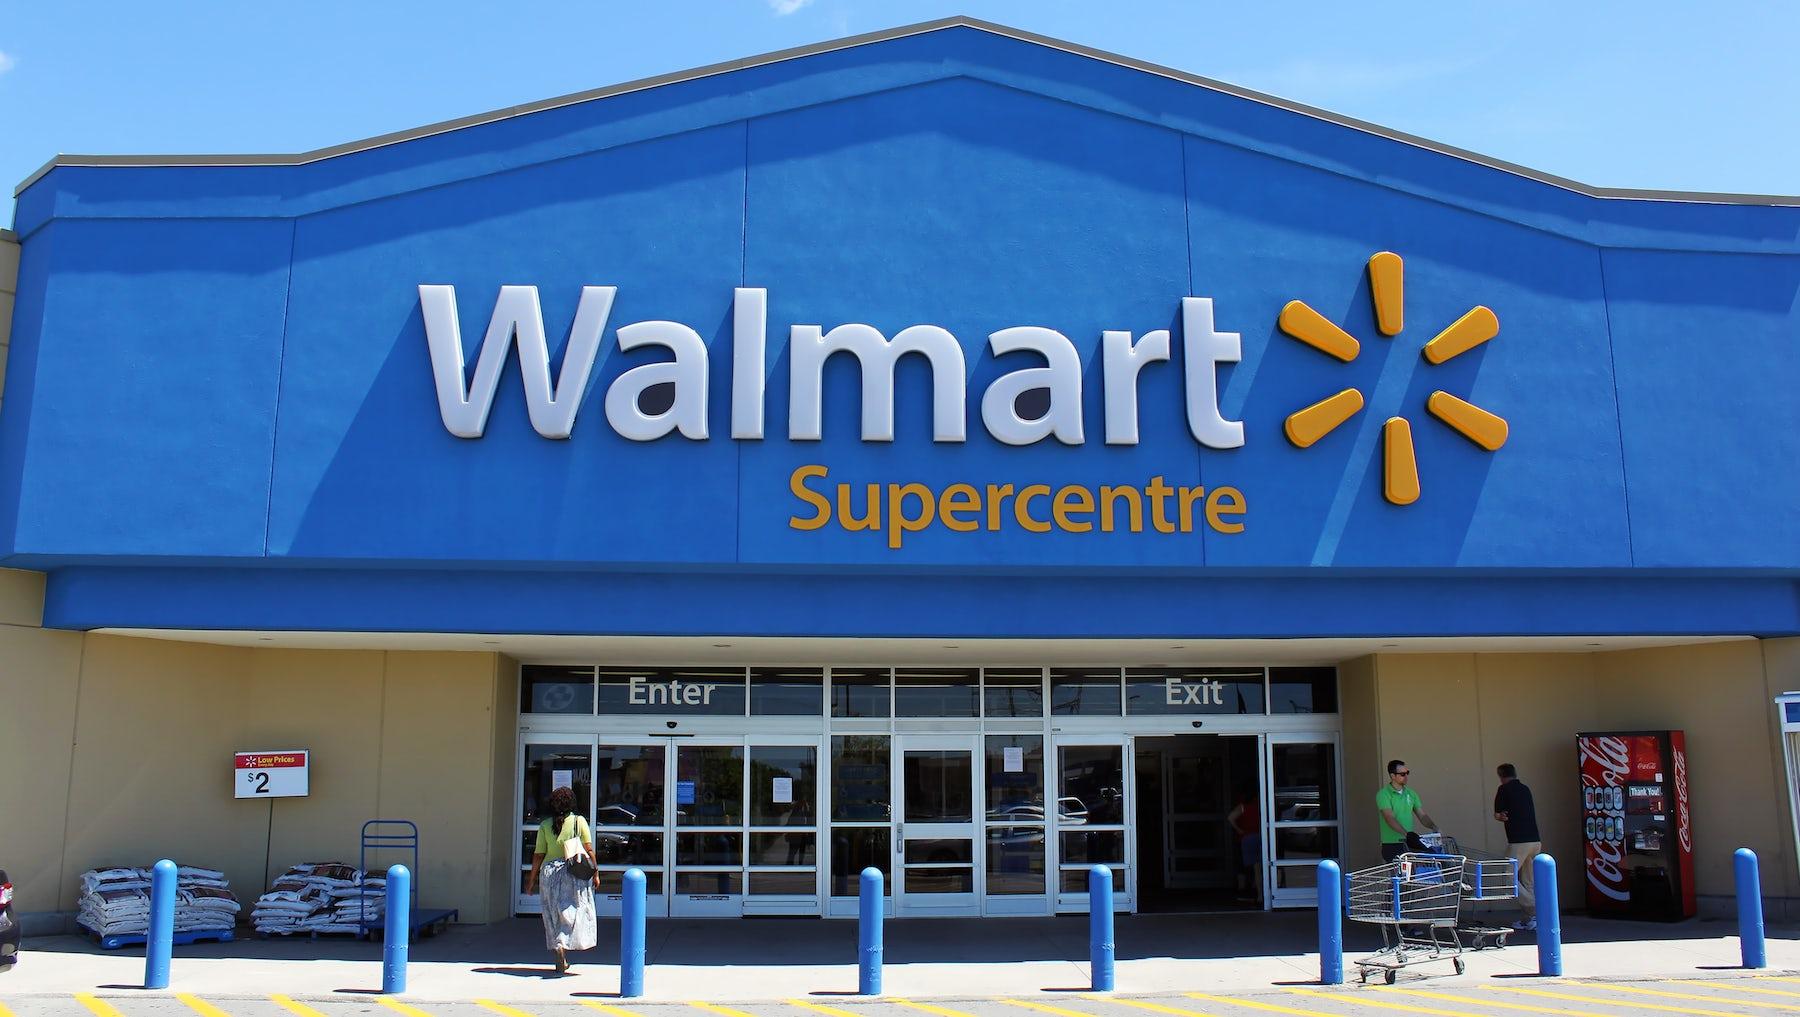 Wal-Mart Supercentre | Source: Shutterstock